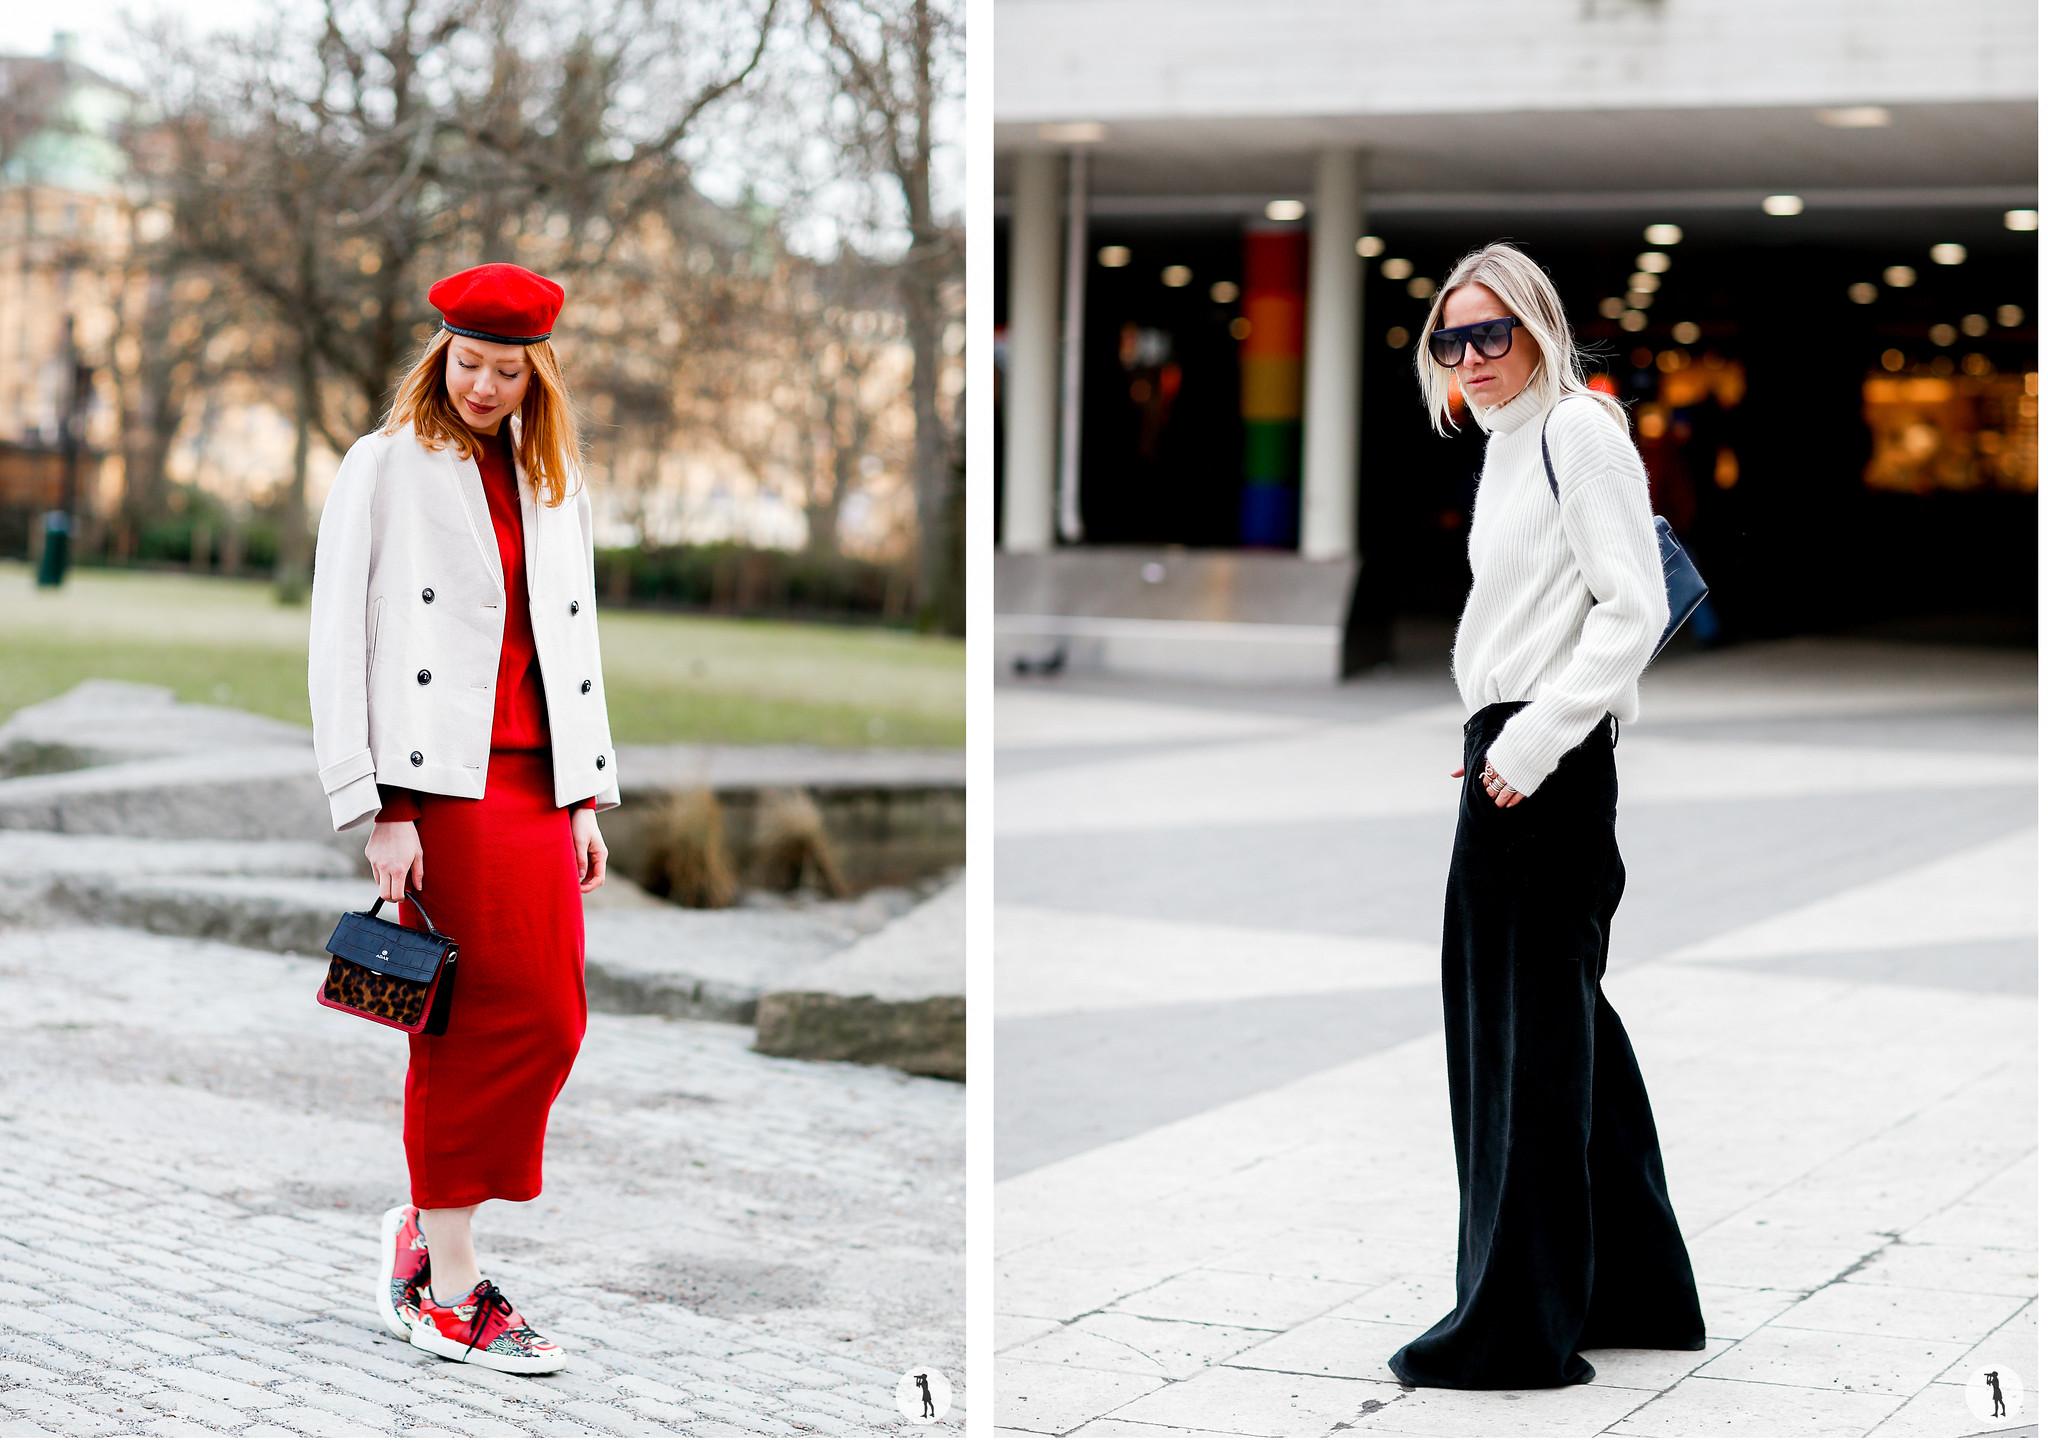 Street Stockholm Fashion Week FW16-17